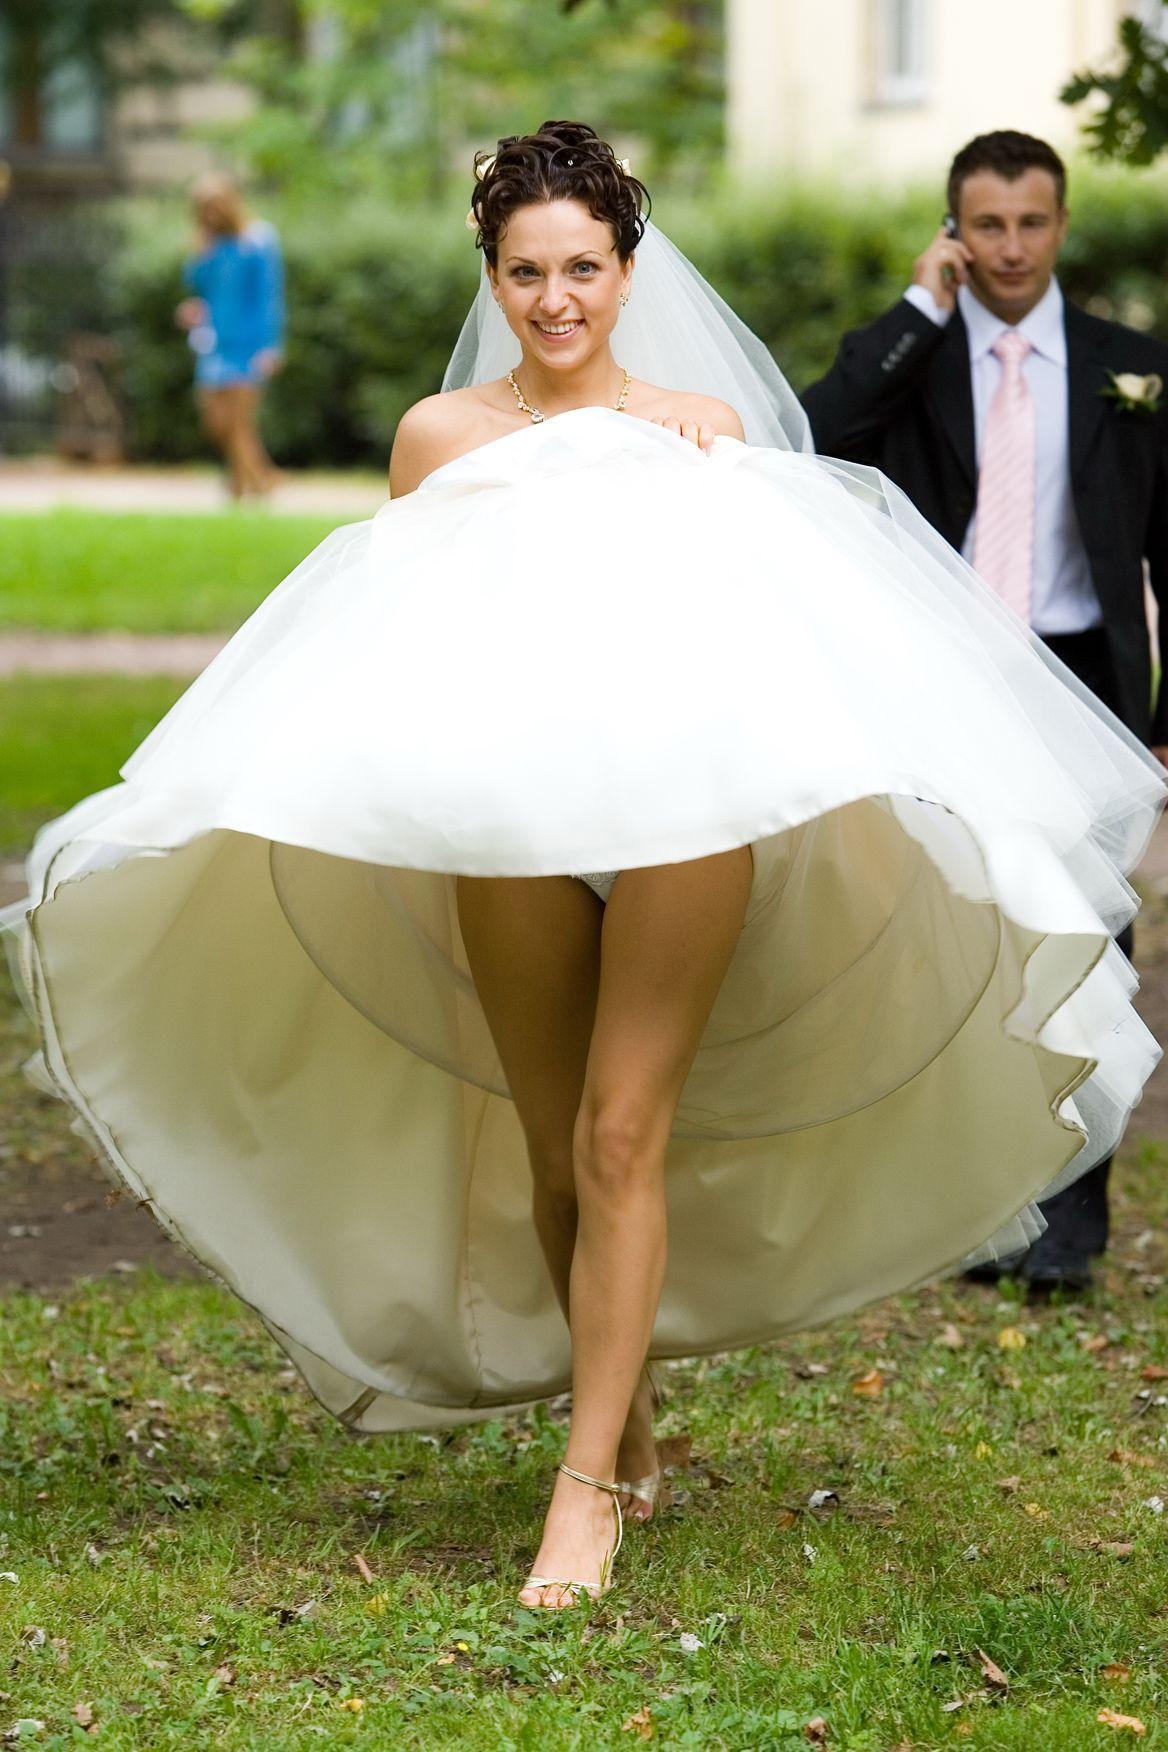 Wedding upskirt pictures